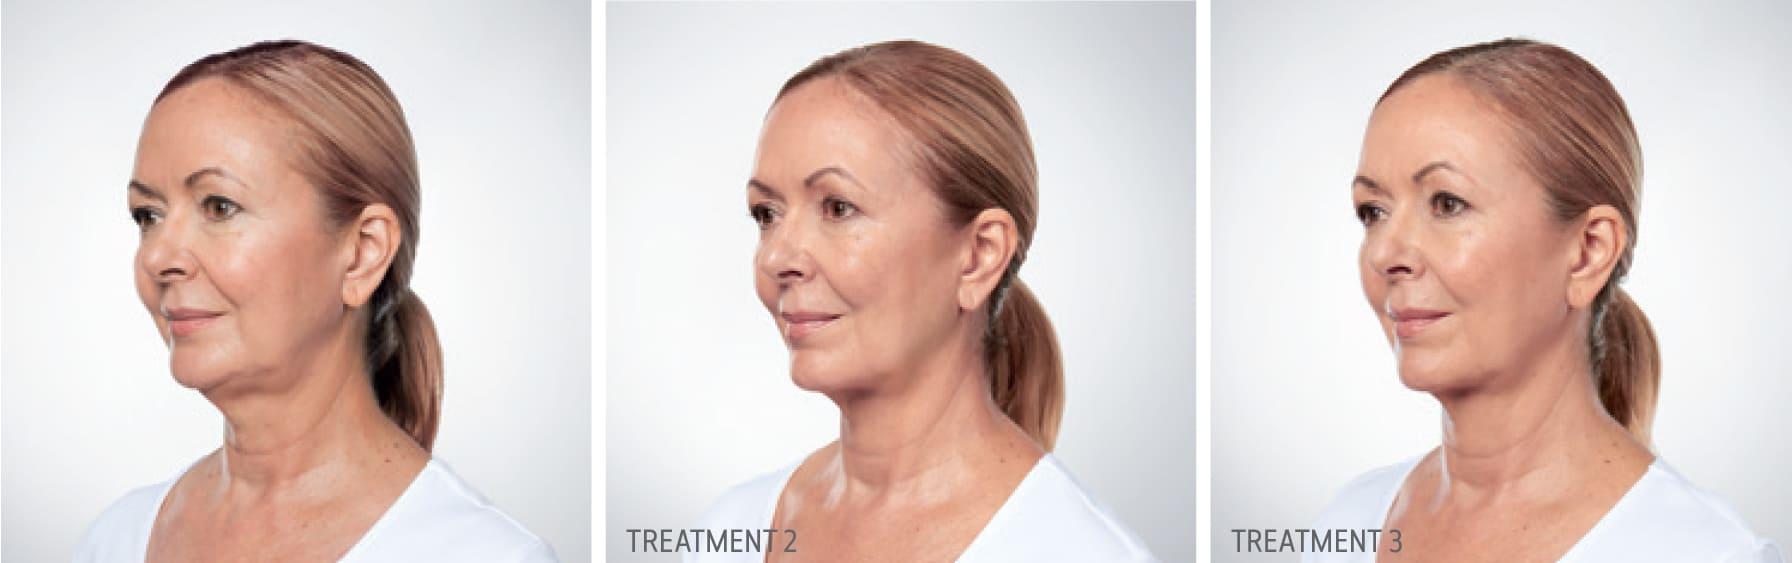 Kybella Treatment Progression 2